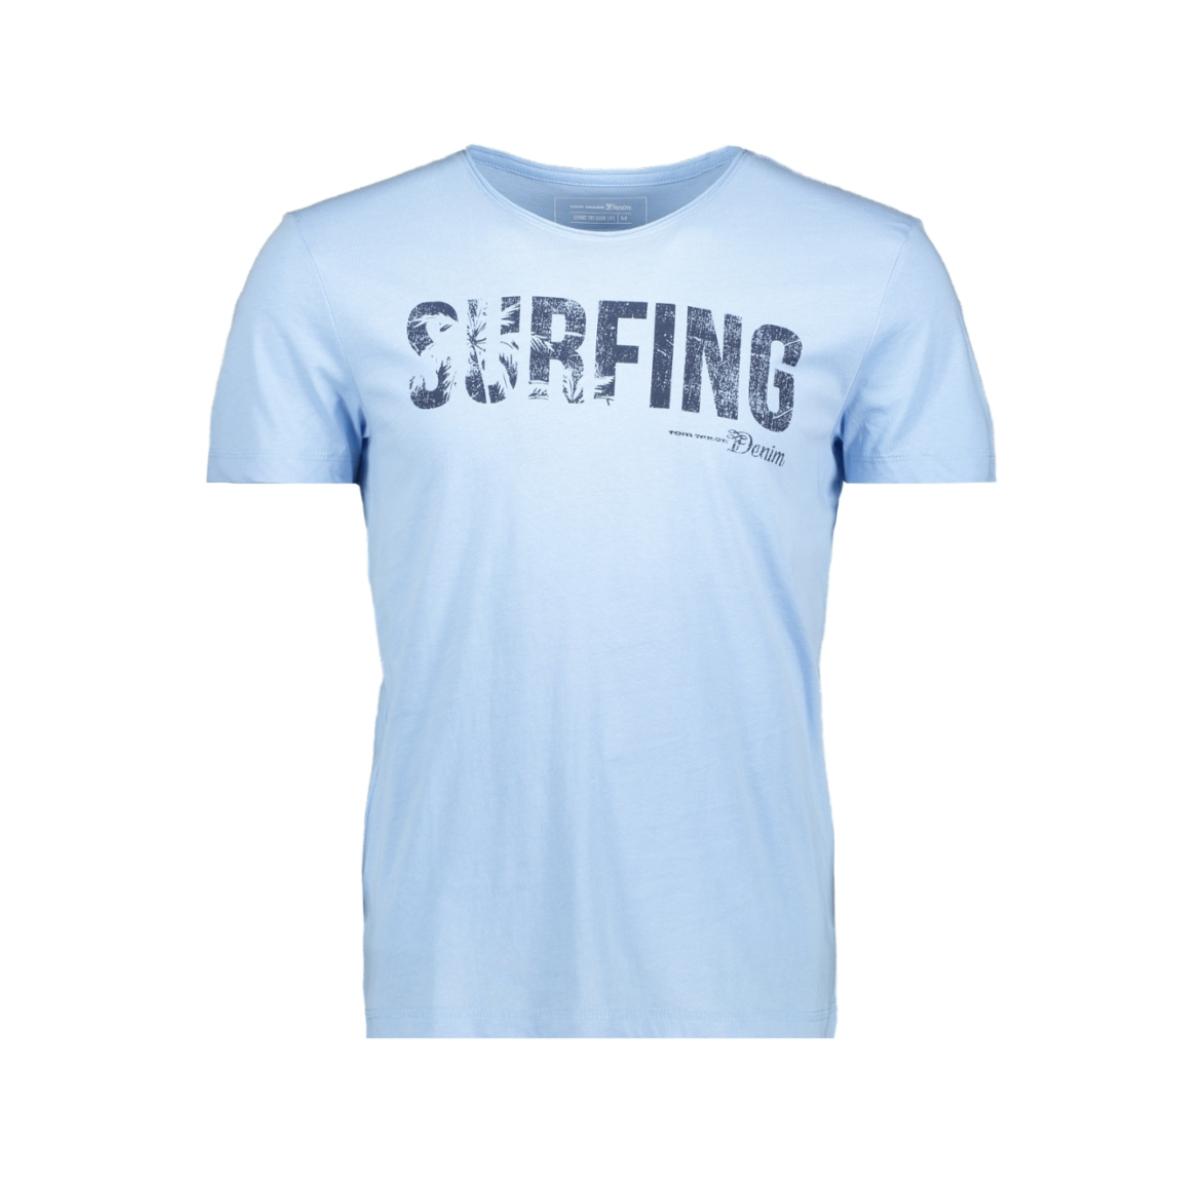 t shirt met tekst 1011137xx12 tom tailor t-shirt 17750